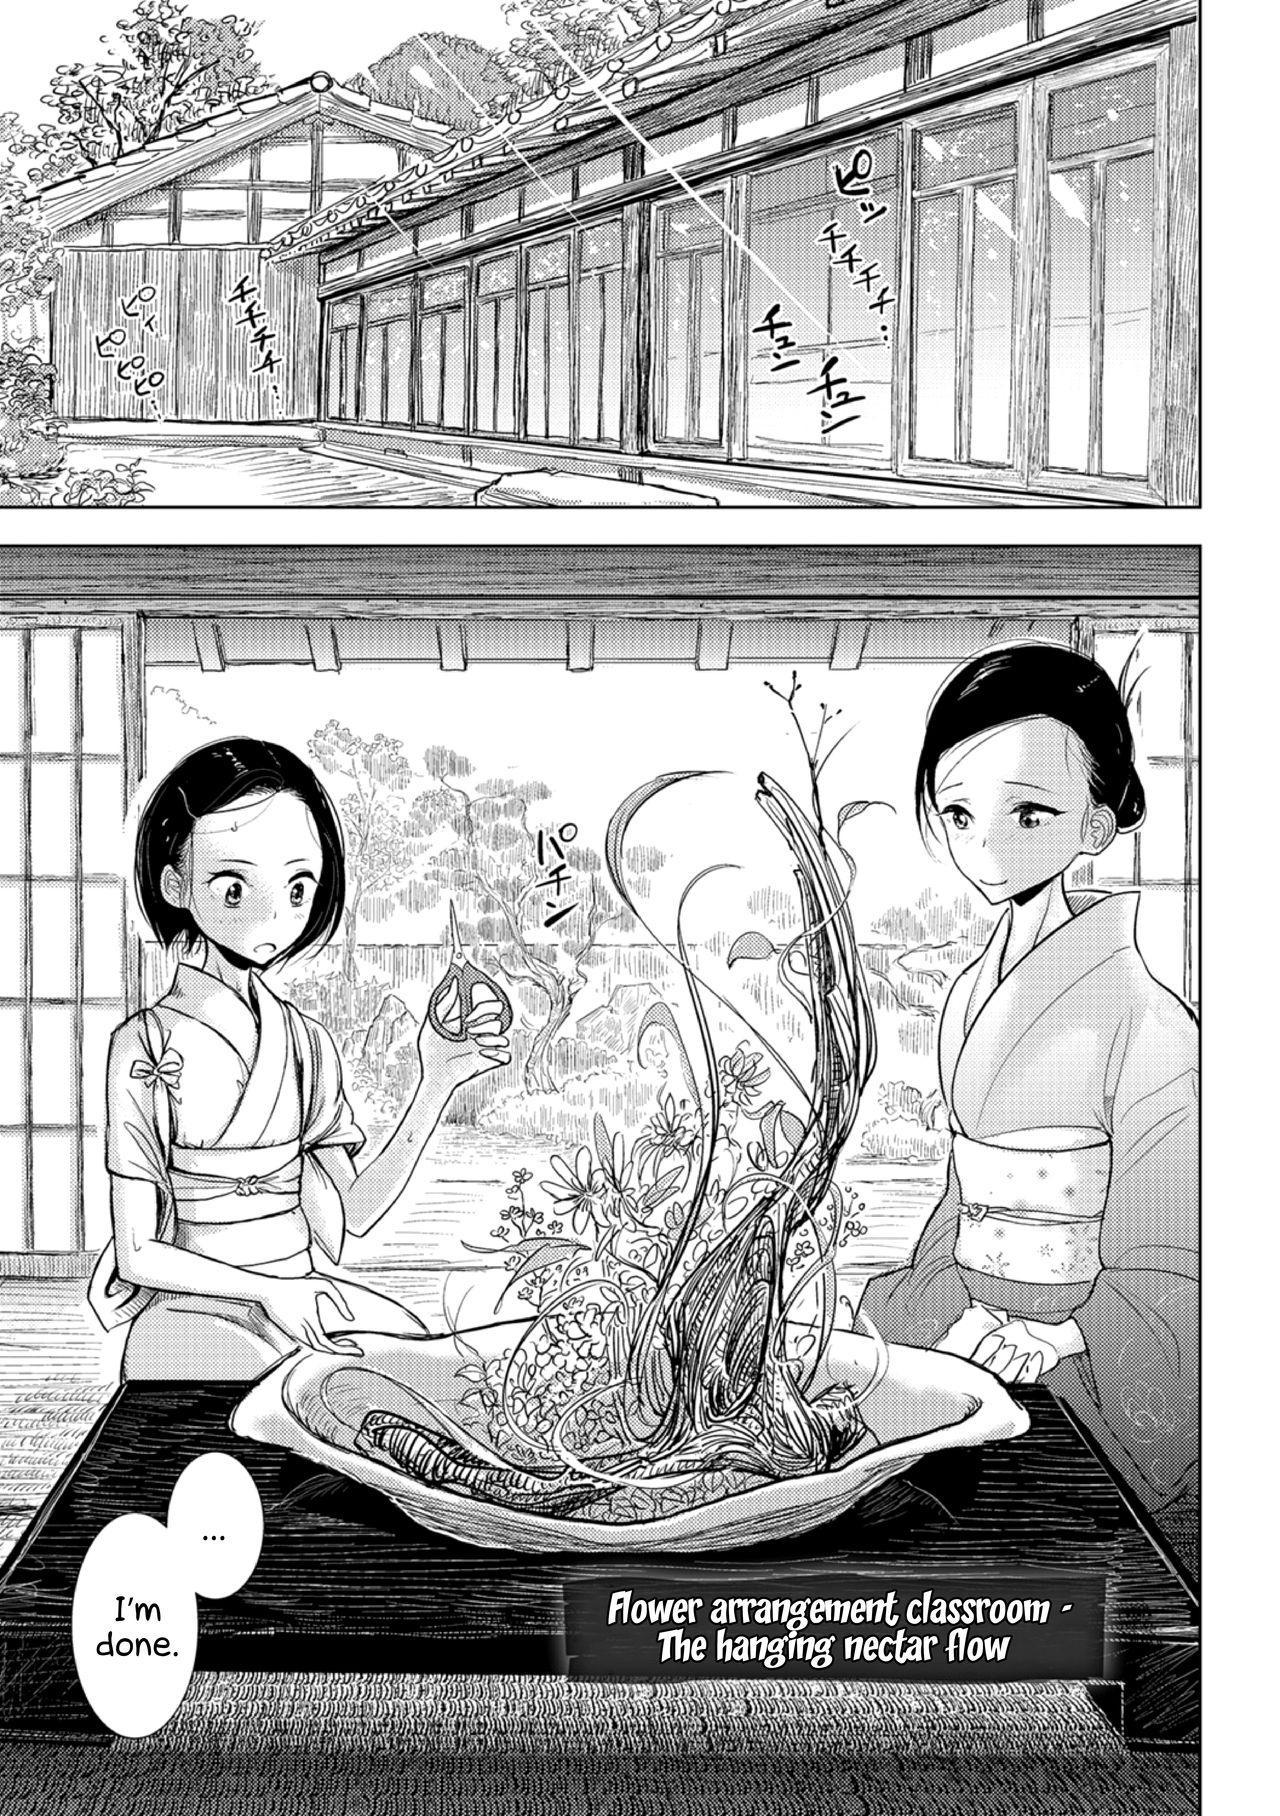 [Dhibi] Kadou kyoushitsu shide mitsu-ryuu | Flower arrangement classroom - The hanging nectar flow (Otokonoko HEAVEN Vol. 26) [English] [Godofloli] [Digital] 0